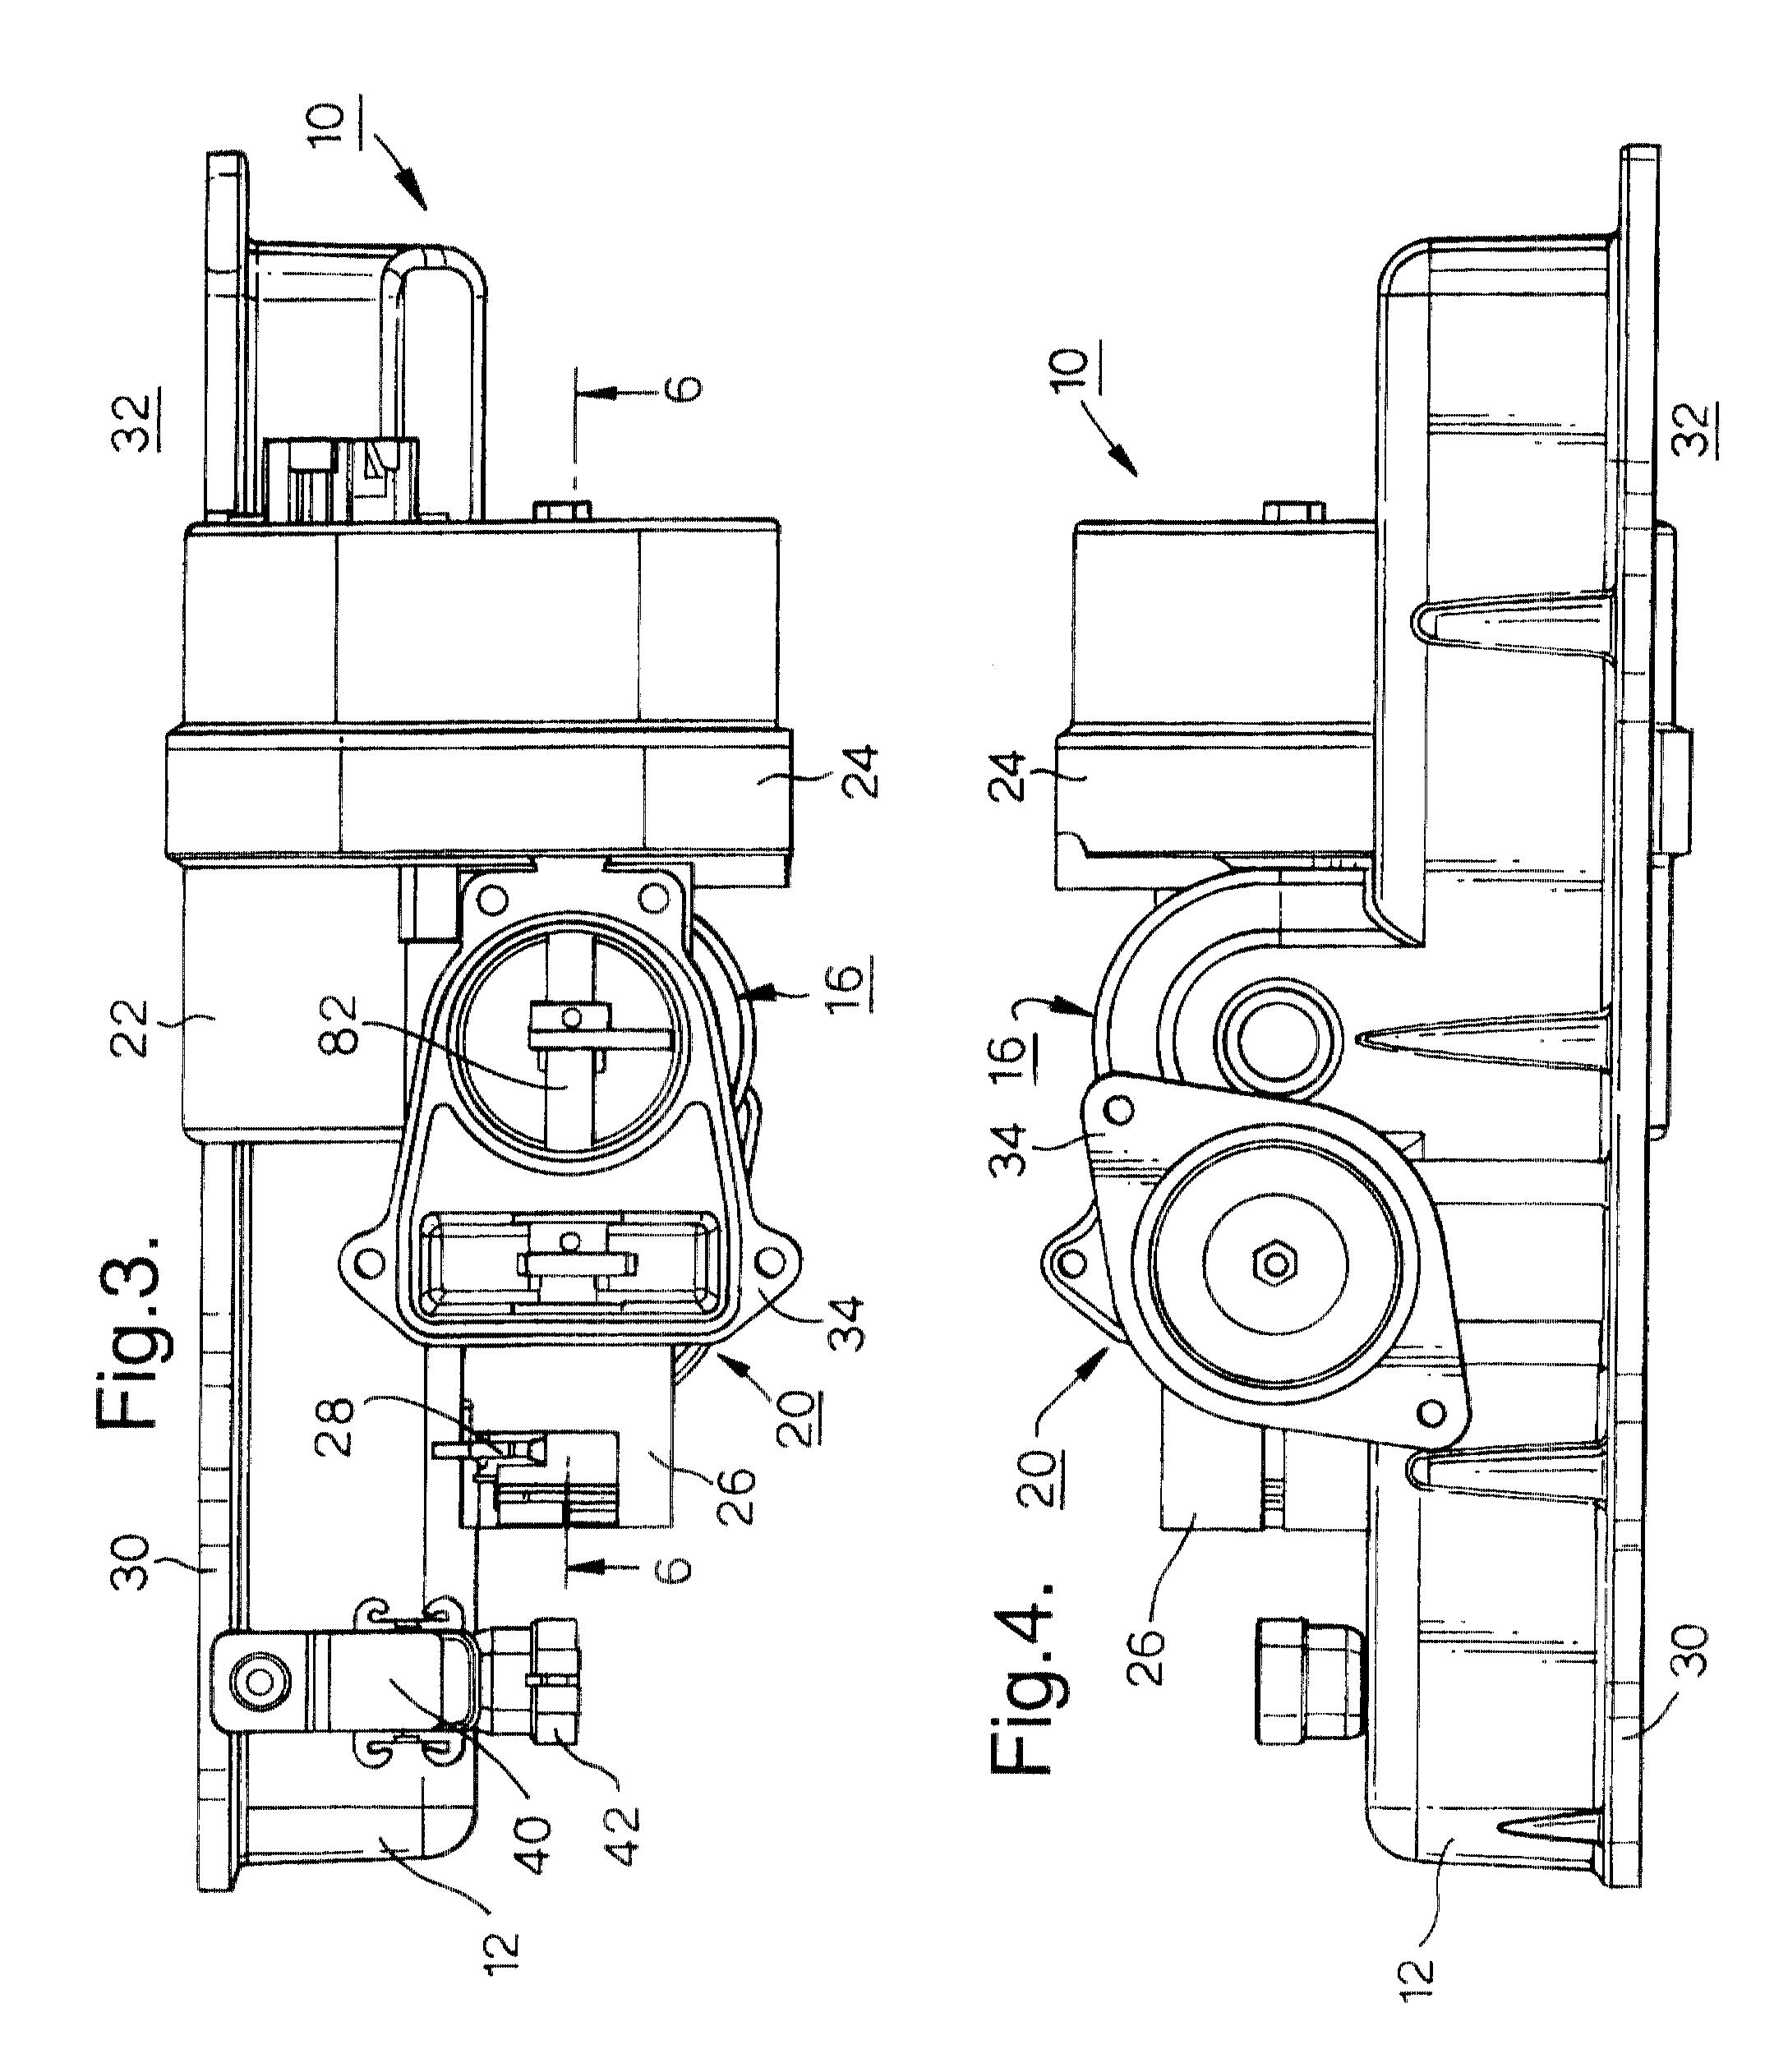 intake manifold of the internal combustion engine Citation: benajes, j, reyes, e, galindo, j, and peidro, j, predesign model for intake manifolds in internal combustion engines, sae technical paper.